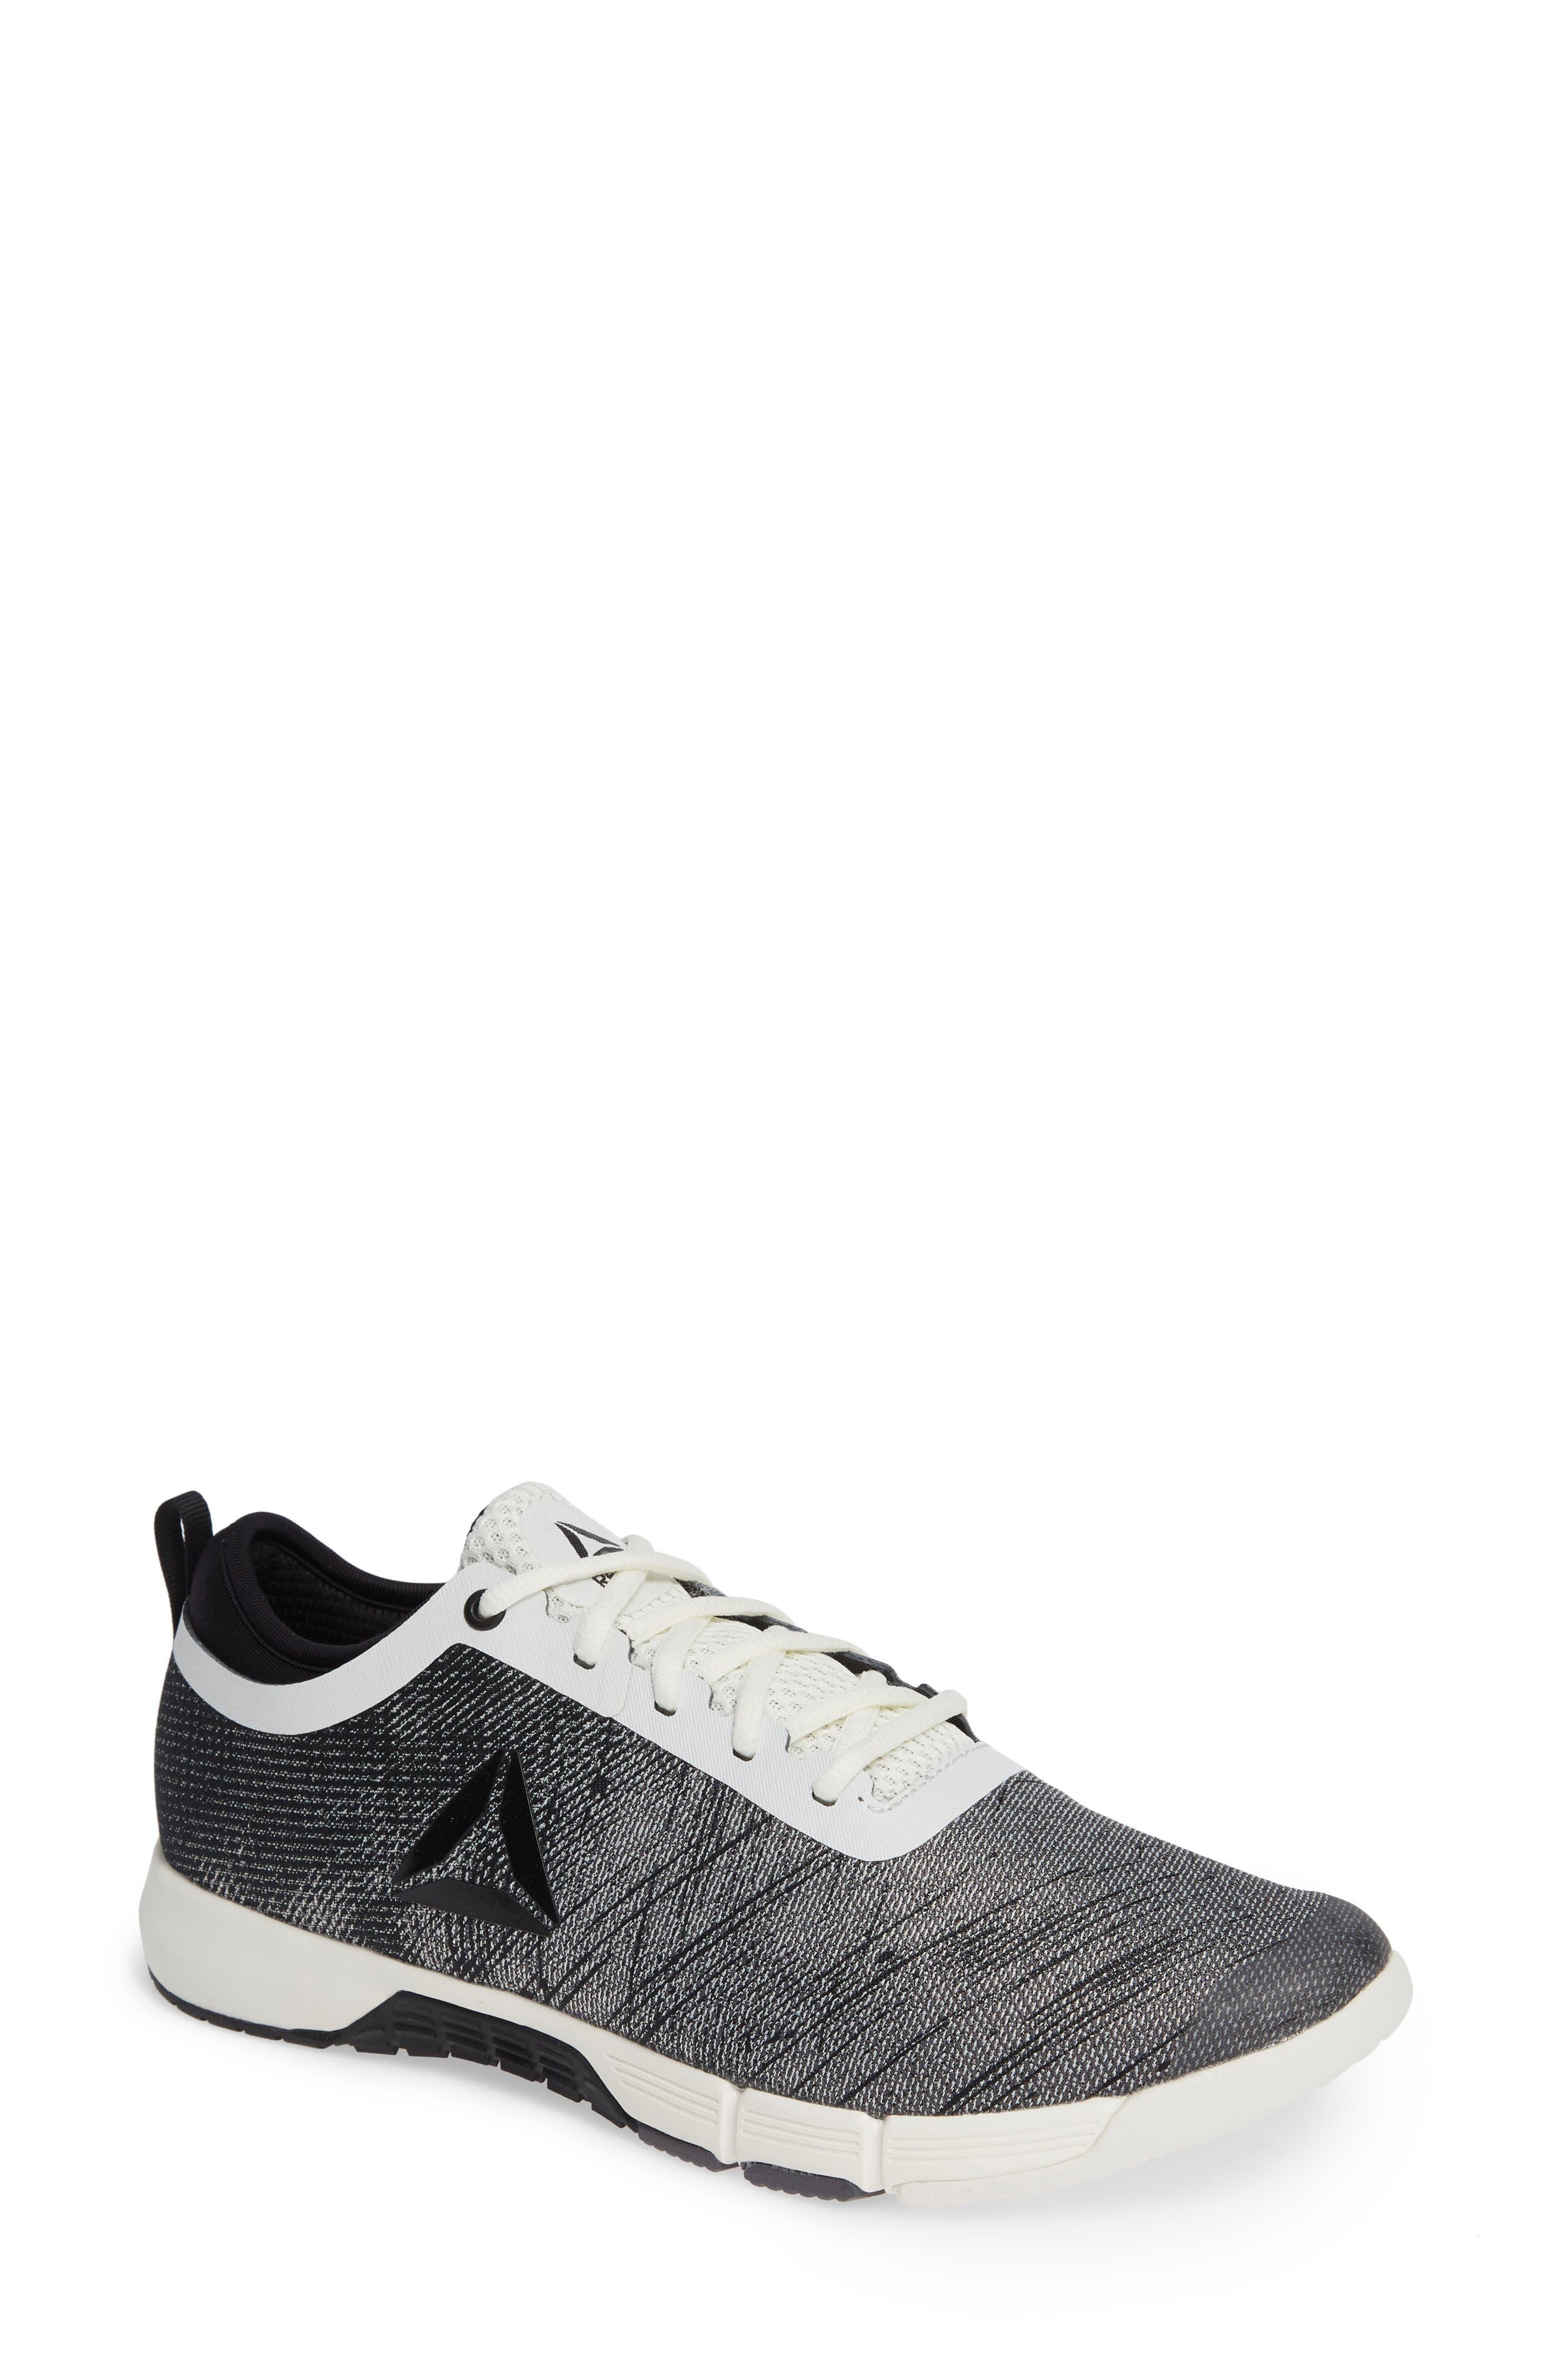 Speed Her TR Training Sneaker,                             Main thumbnail 1, color,                             CHALK/ BLACK/ ASH GREY